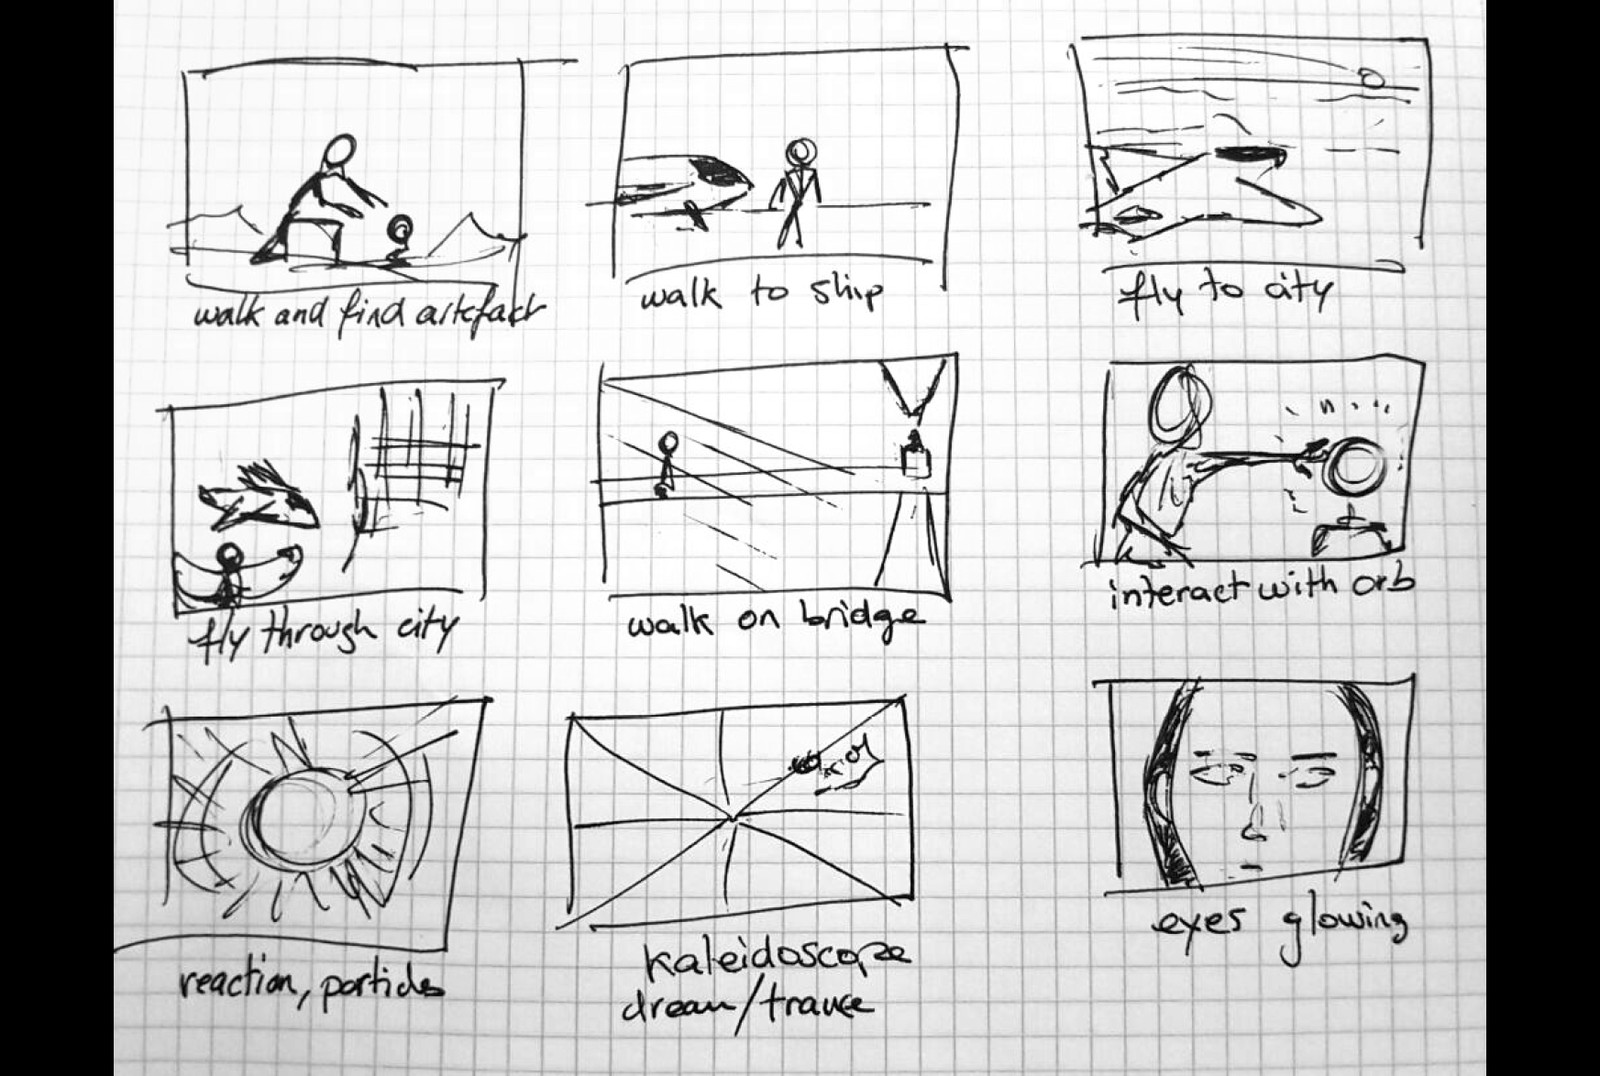 Storyboard | Yvan Feusi & James Hilkim